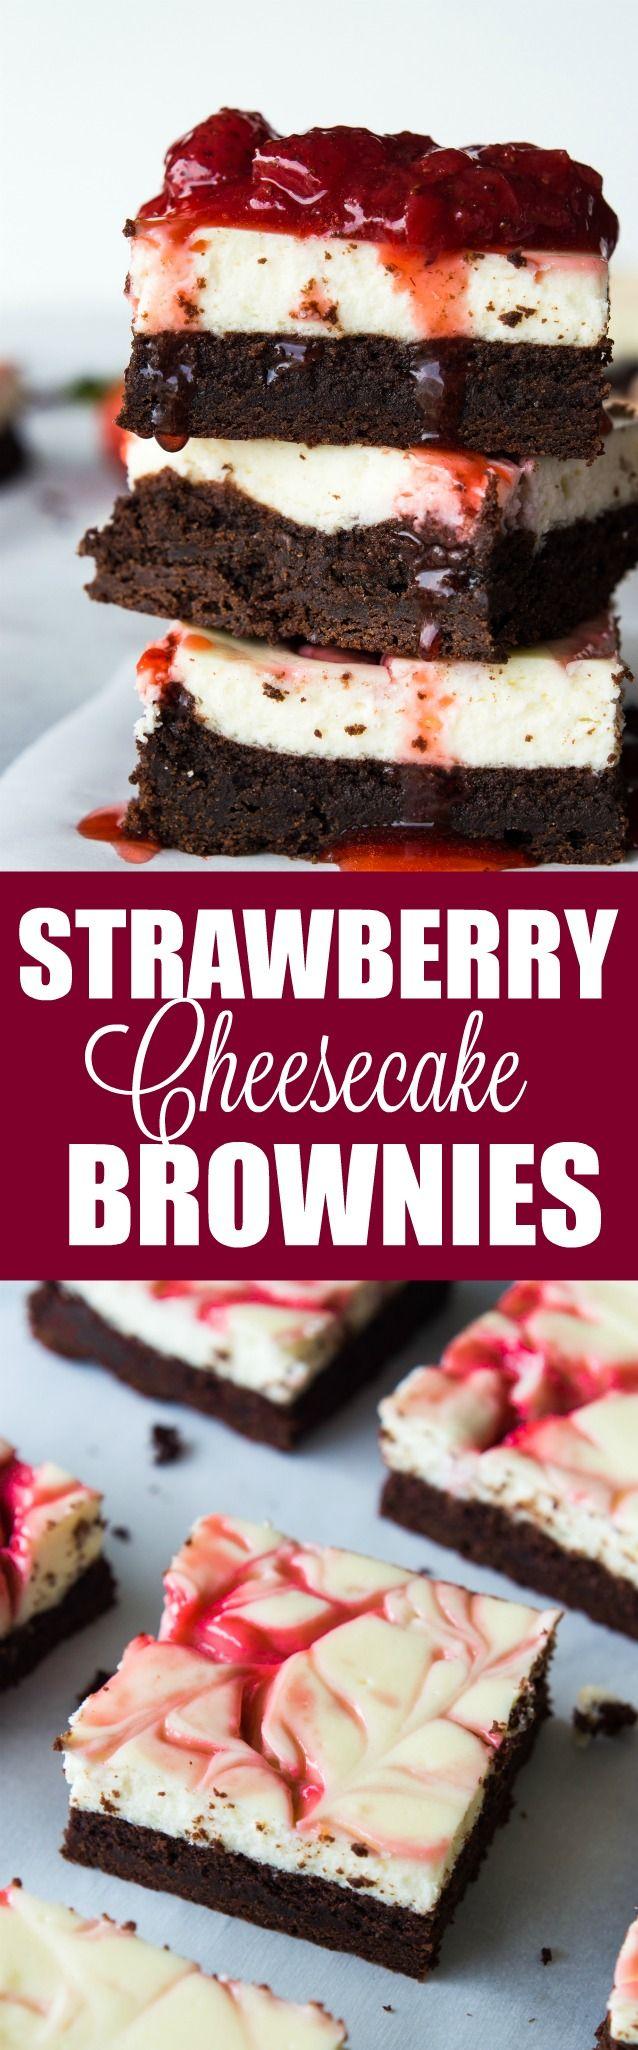 Cheesecake clipart strawberry sauce 25+ Strawberry Strawberry Best ideas